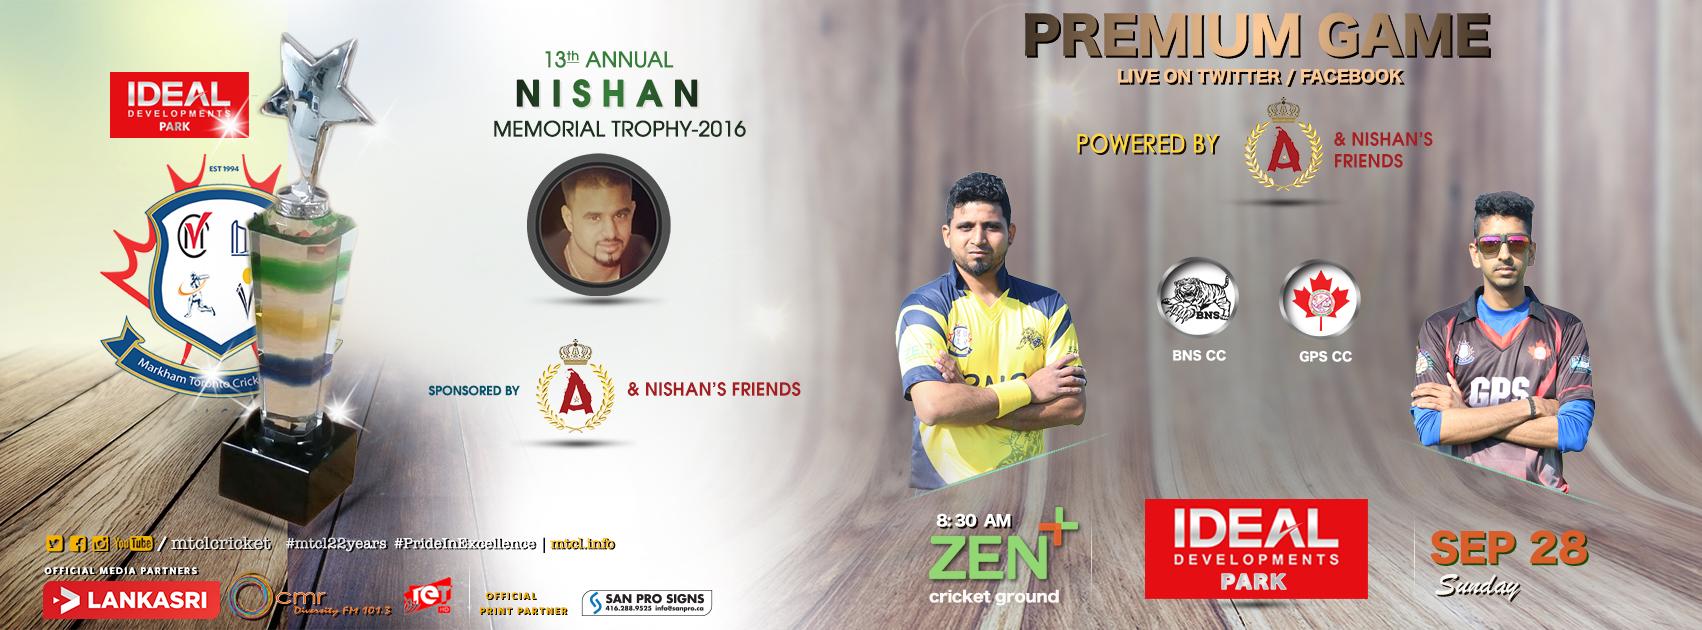 Premium Games-NishanTrophy2016